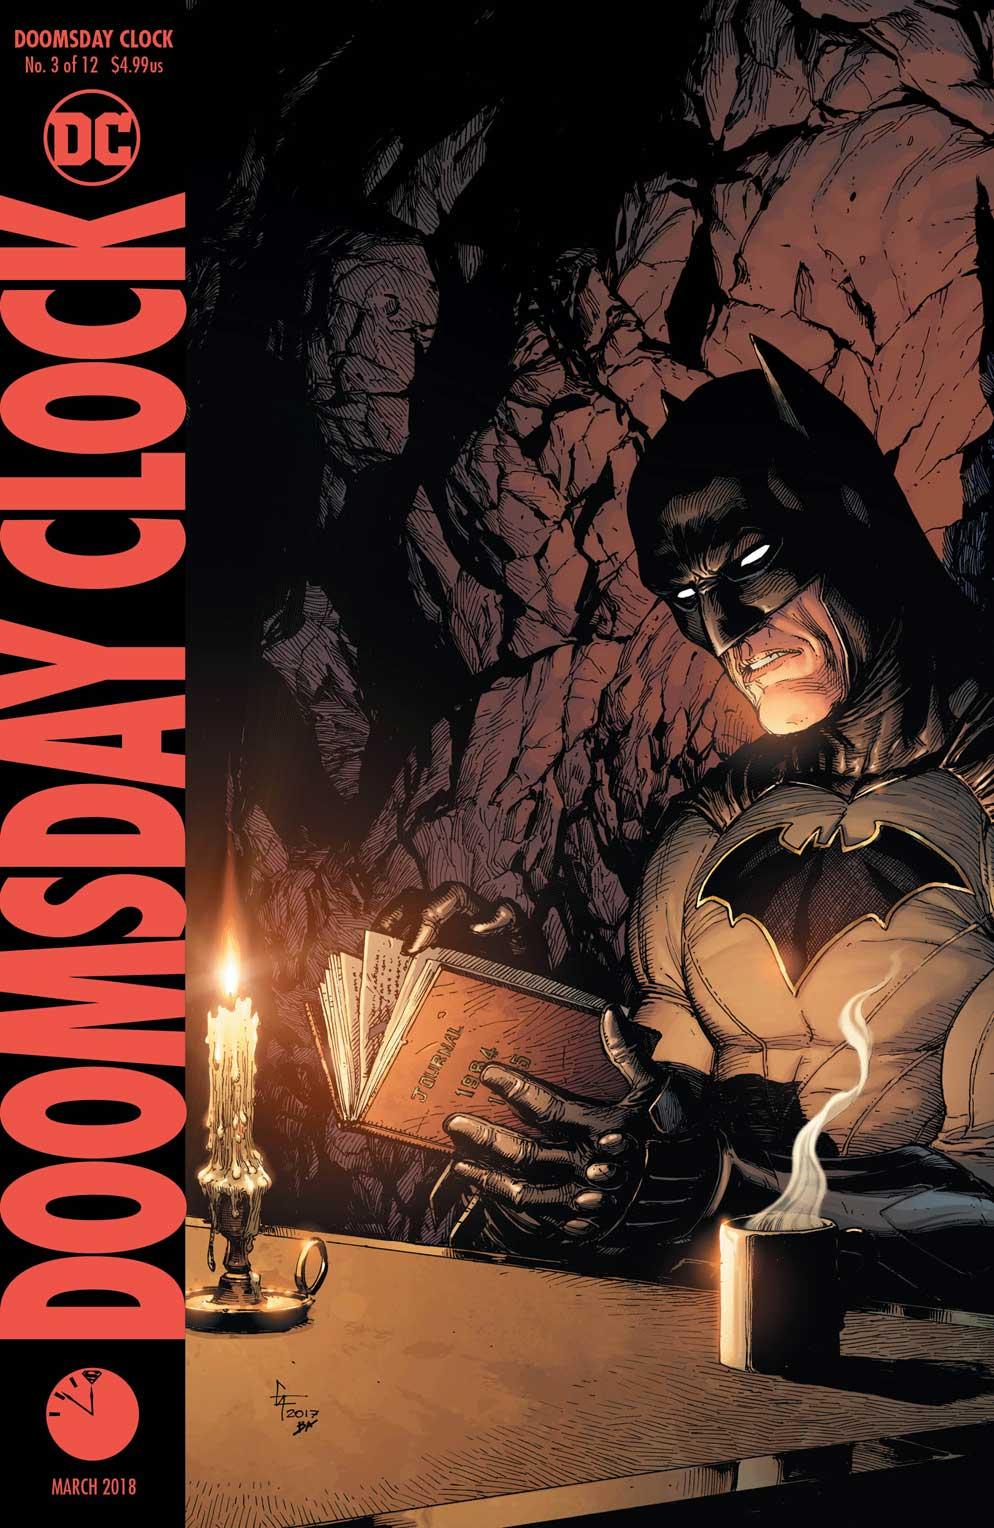 Doomsday Clock 3 Variant - DC Comics News